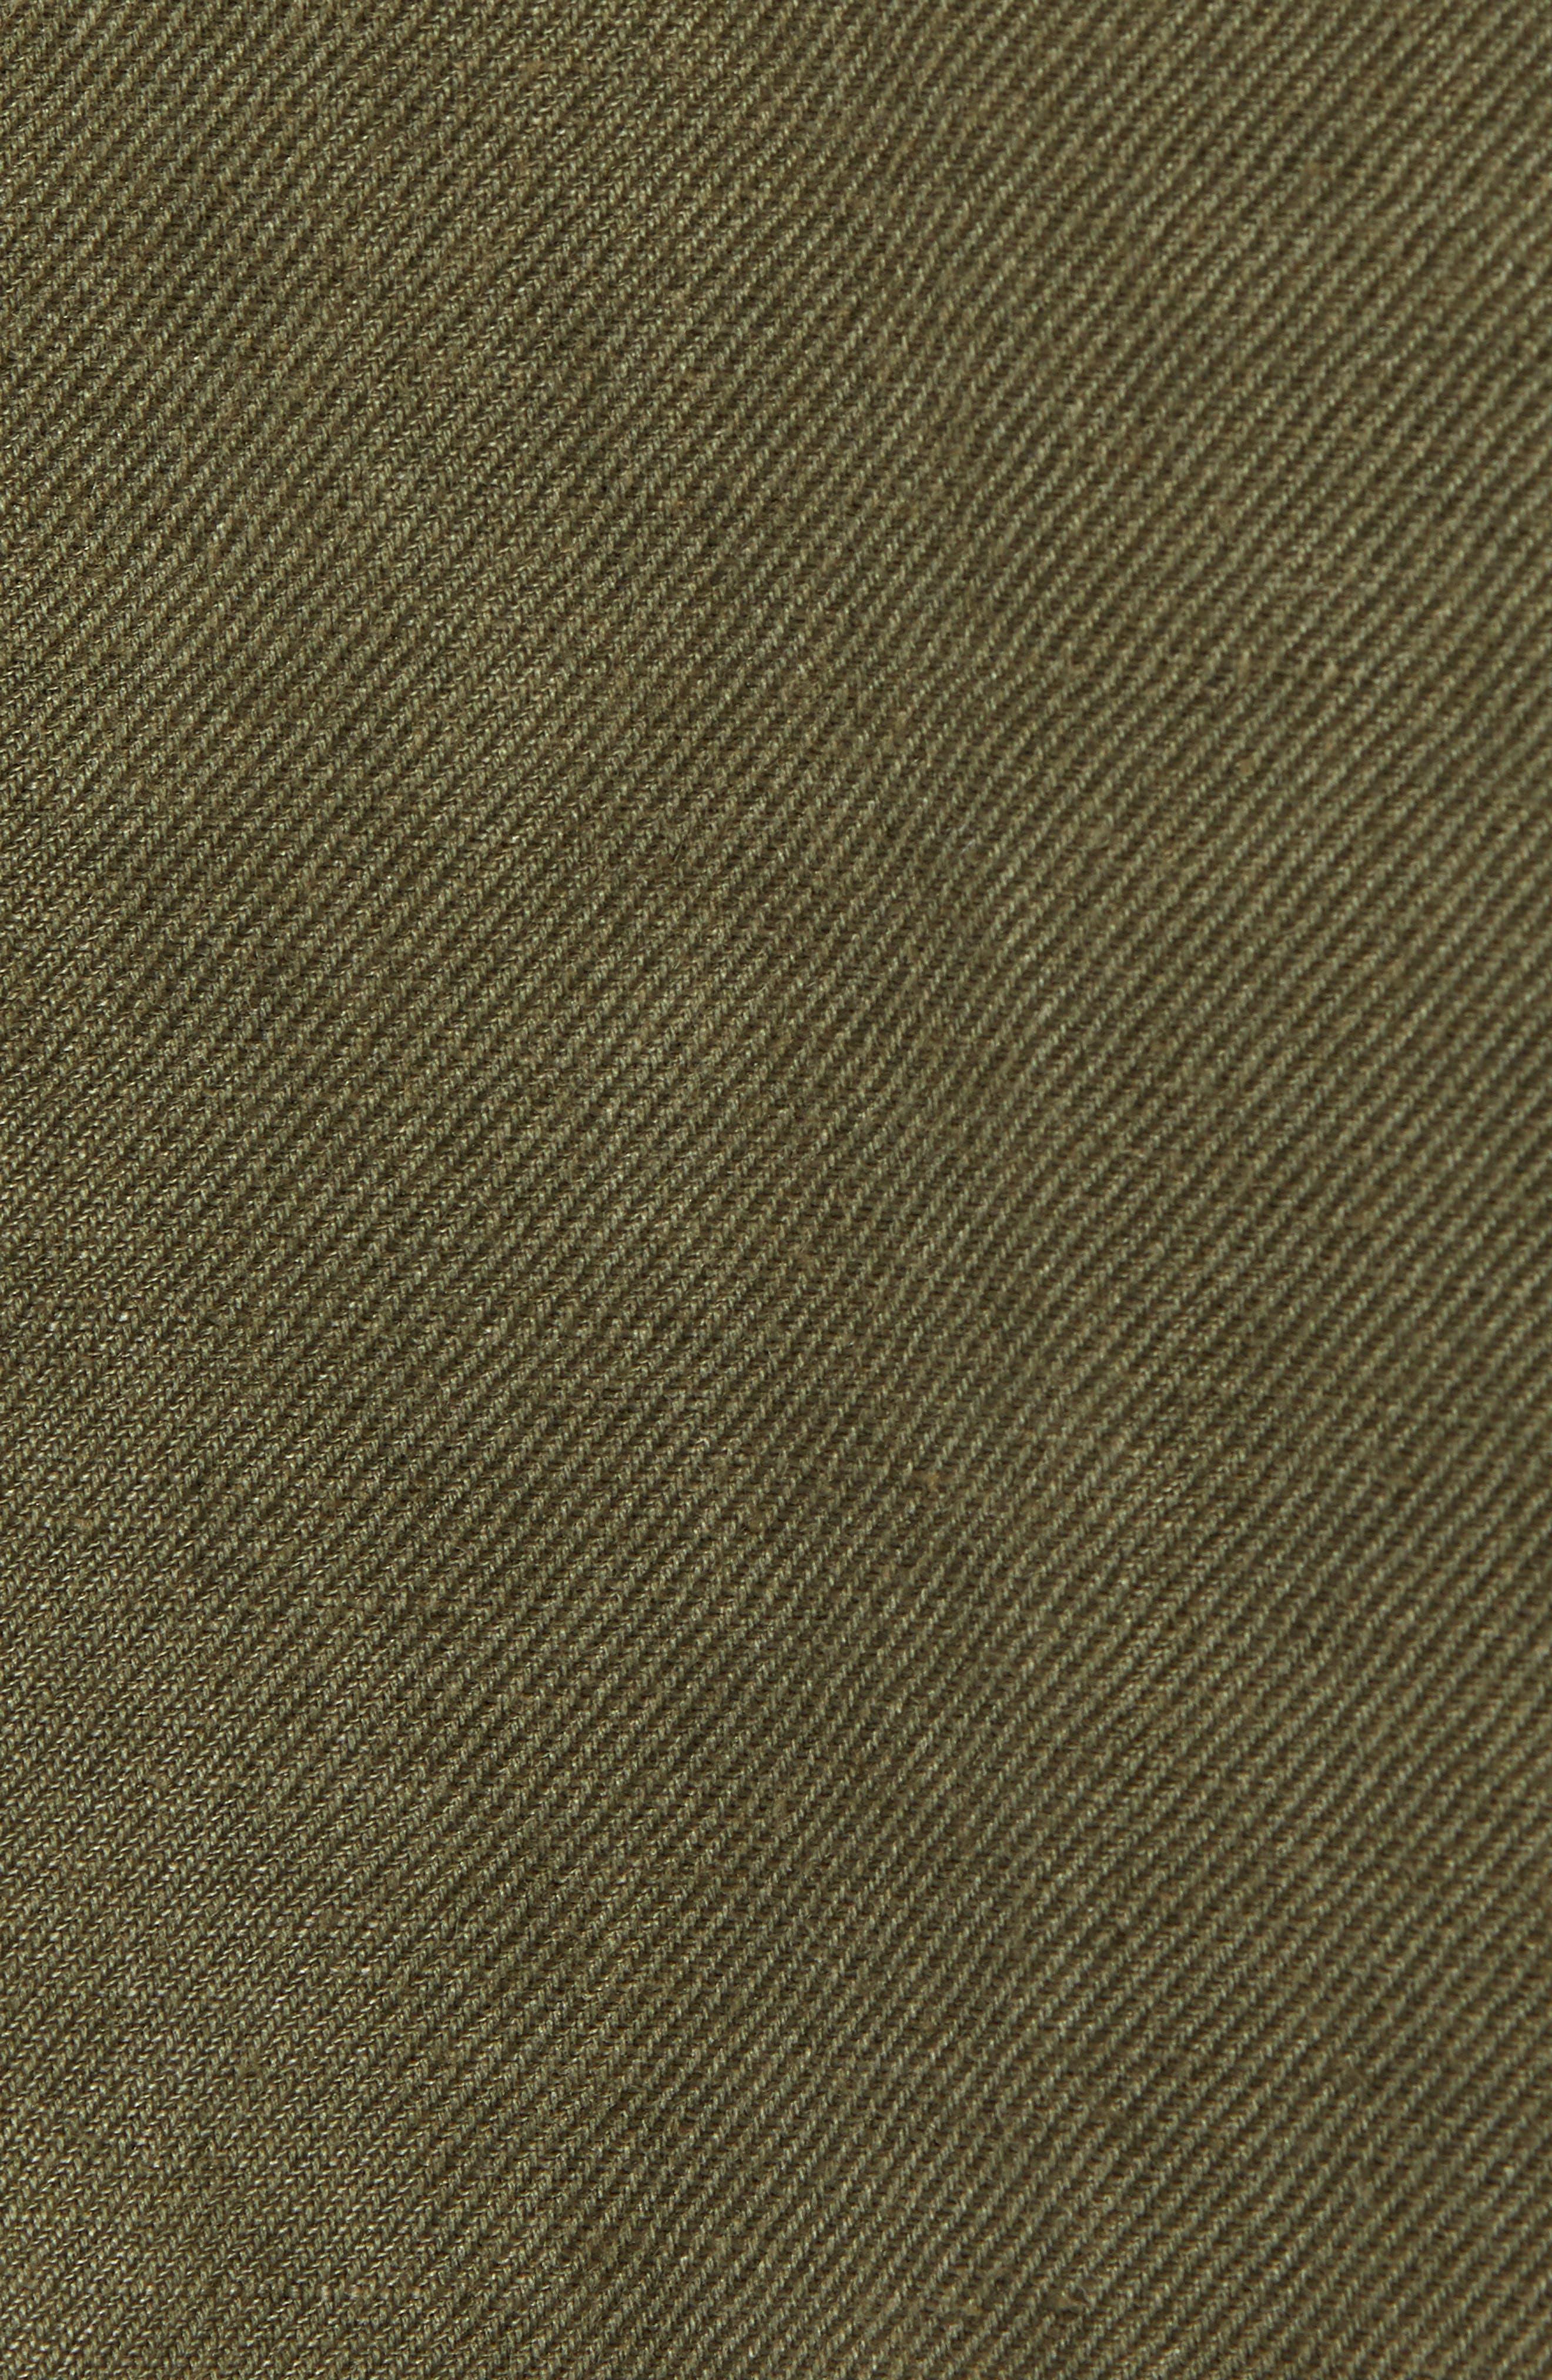 Linen Blend Field Jacket,                             Alternate thumbnail 7, color,                             OLIVE SARMA